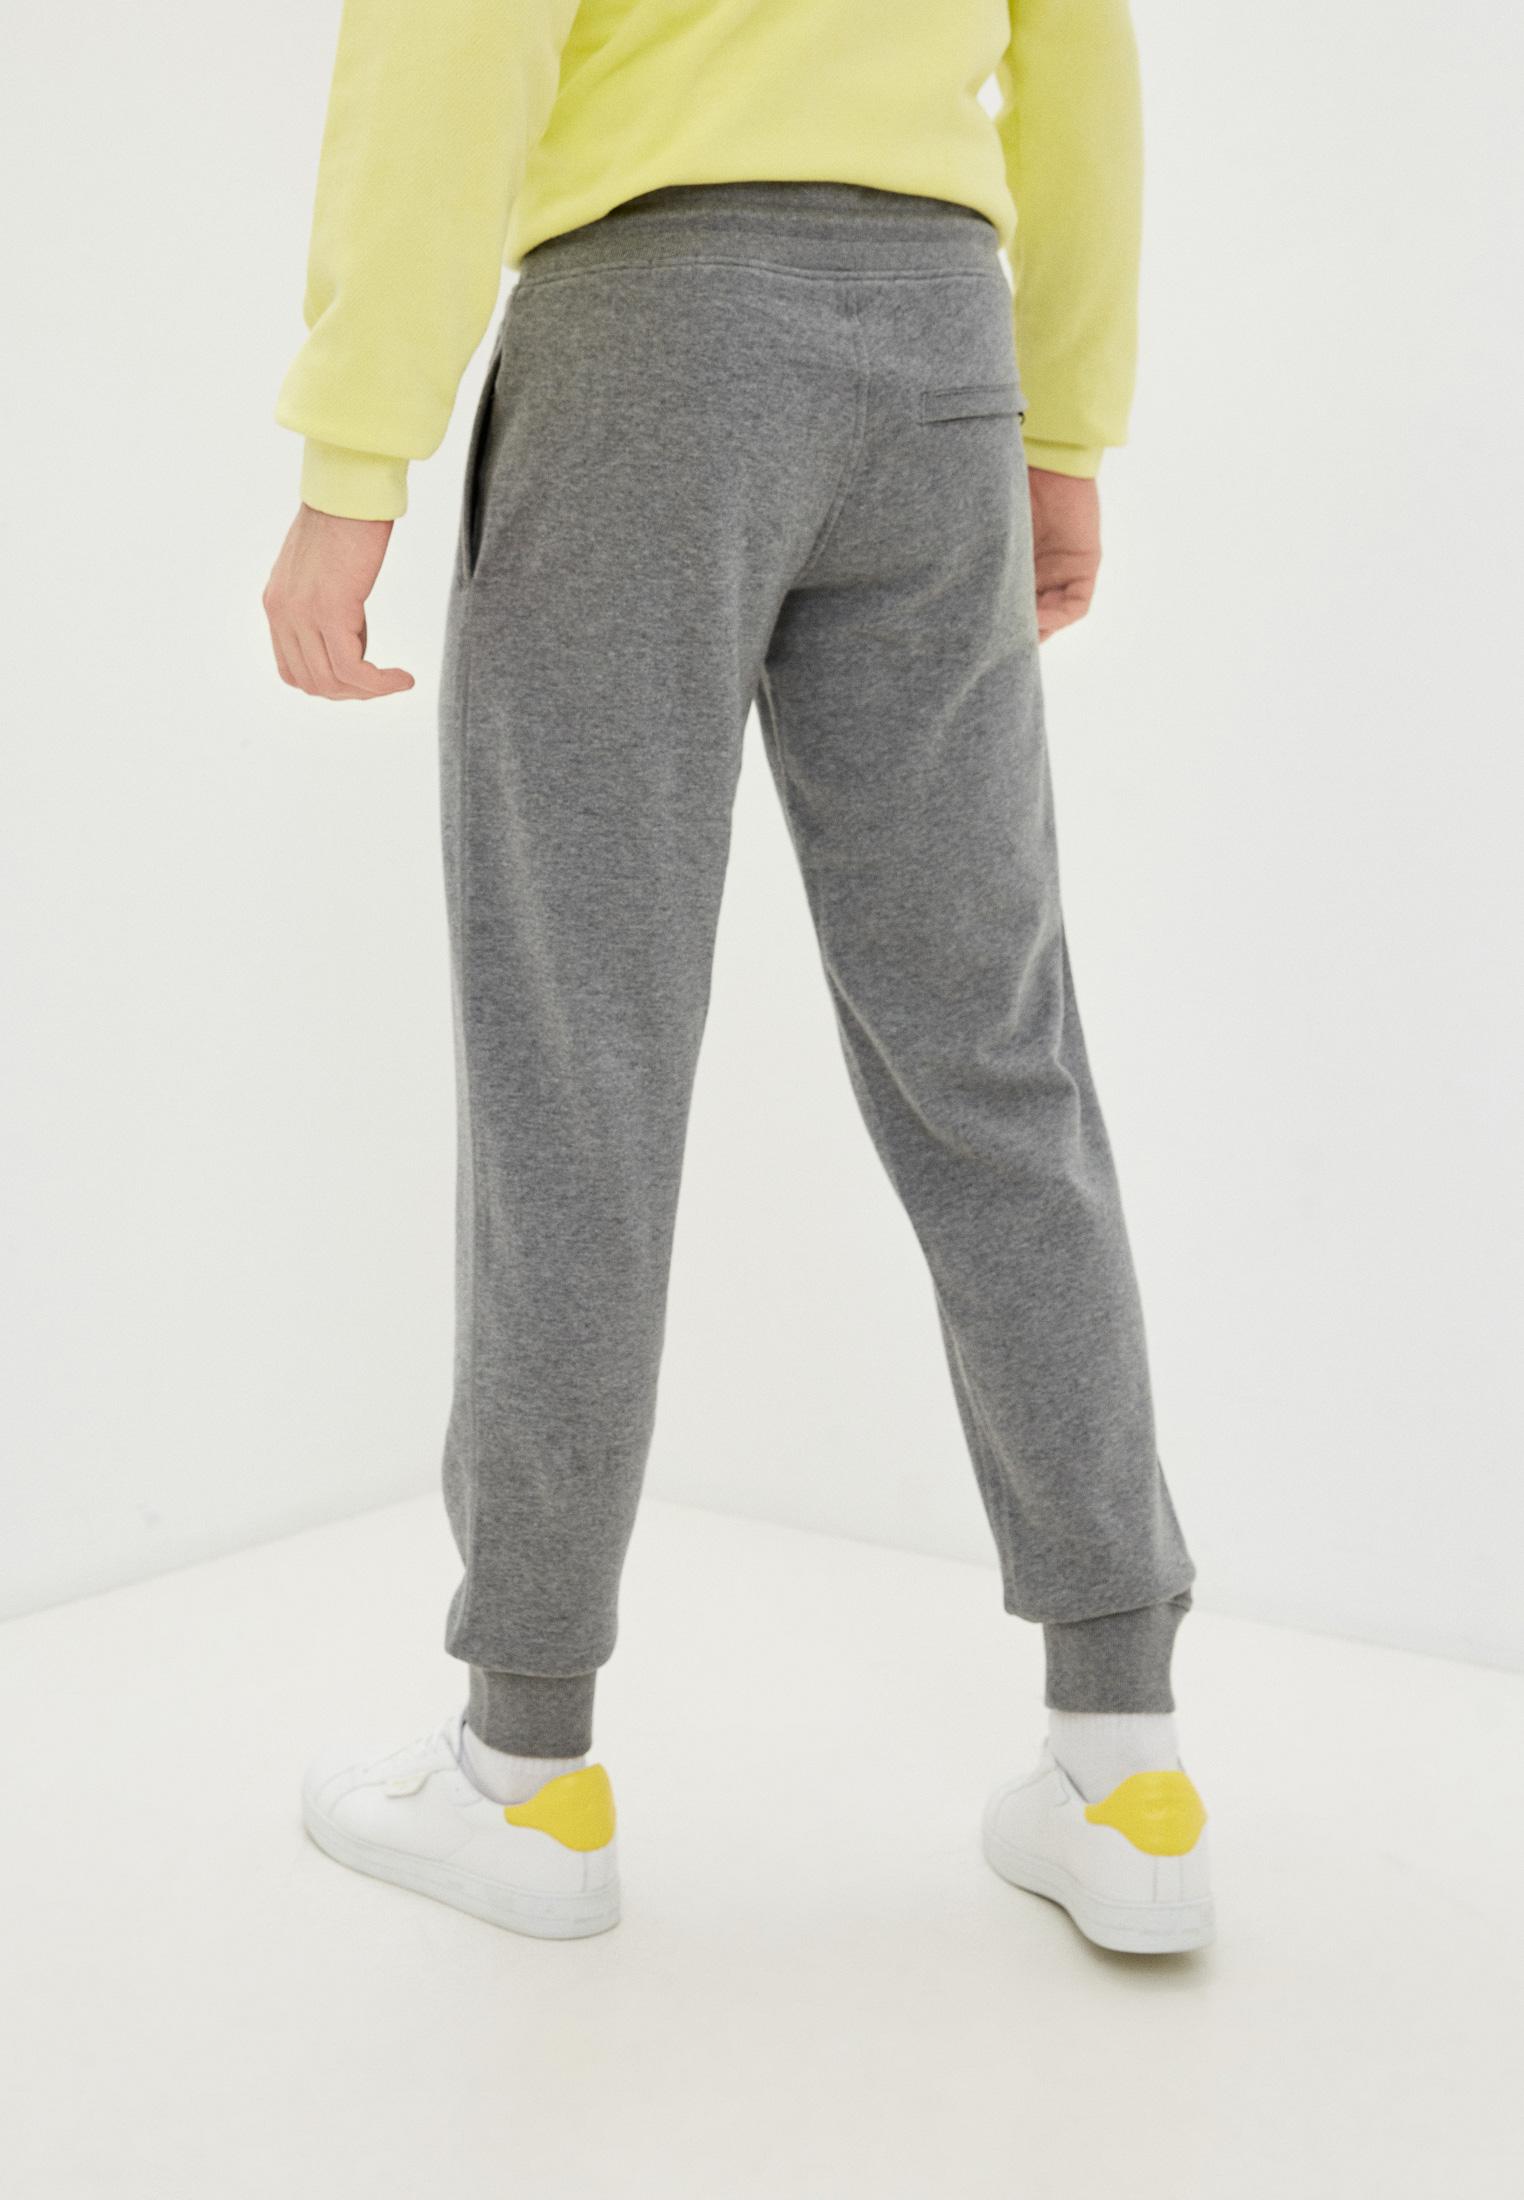 Мужские спортивные брюки Armani Jeans (Армани Джинс) 0MP84RN: изображение 4